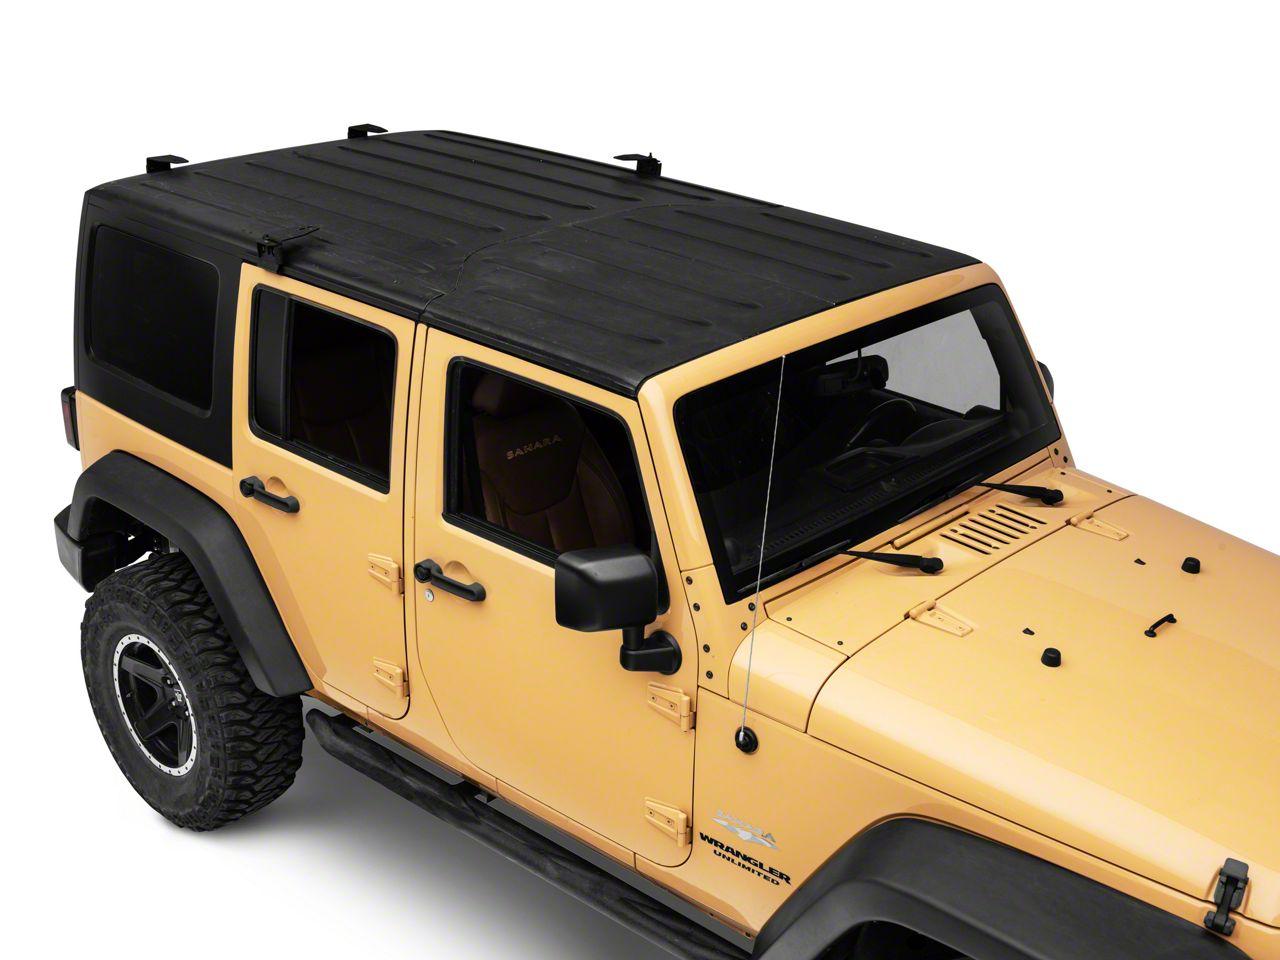 Smittybilt Jeep Wrangler Defender Rack Roof Mounting Kit Ds31 4 07 18 Jeep Wrangler Jk W Factory Hard Top